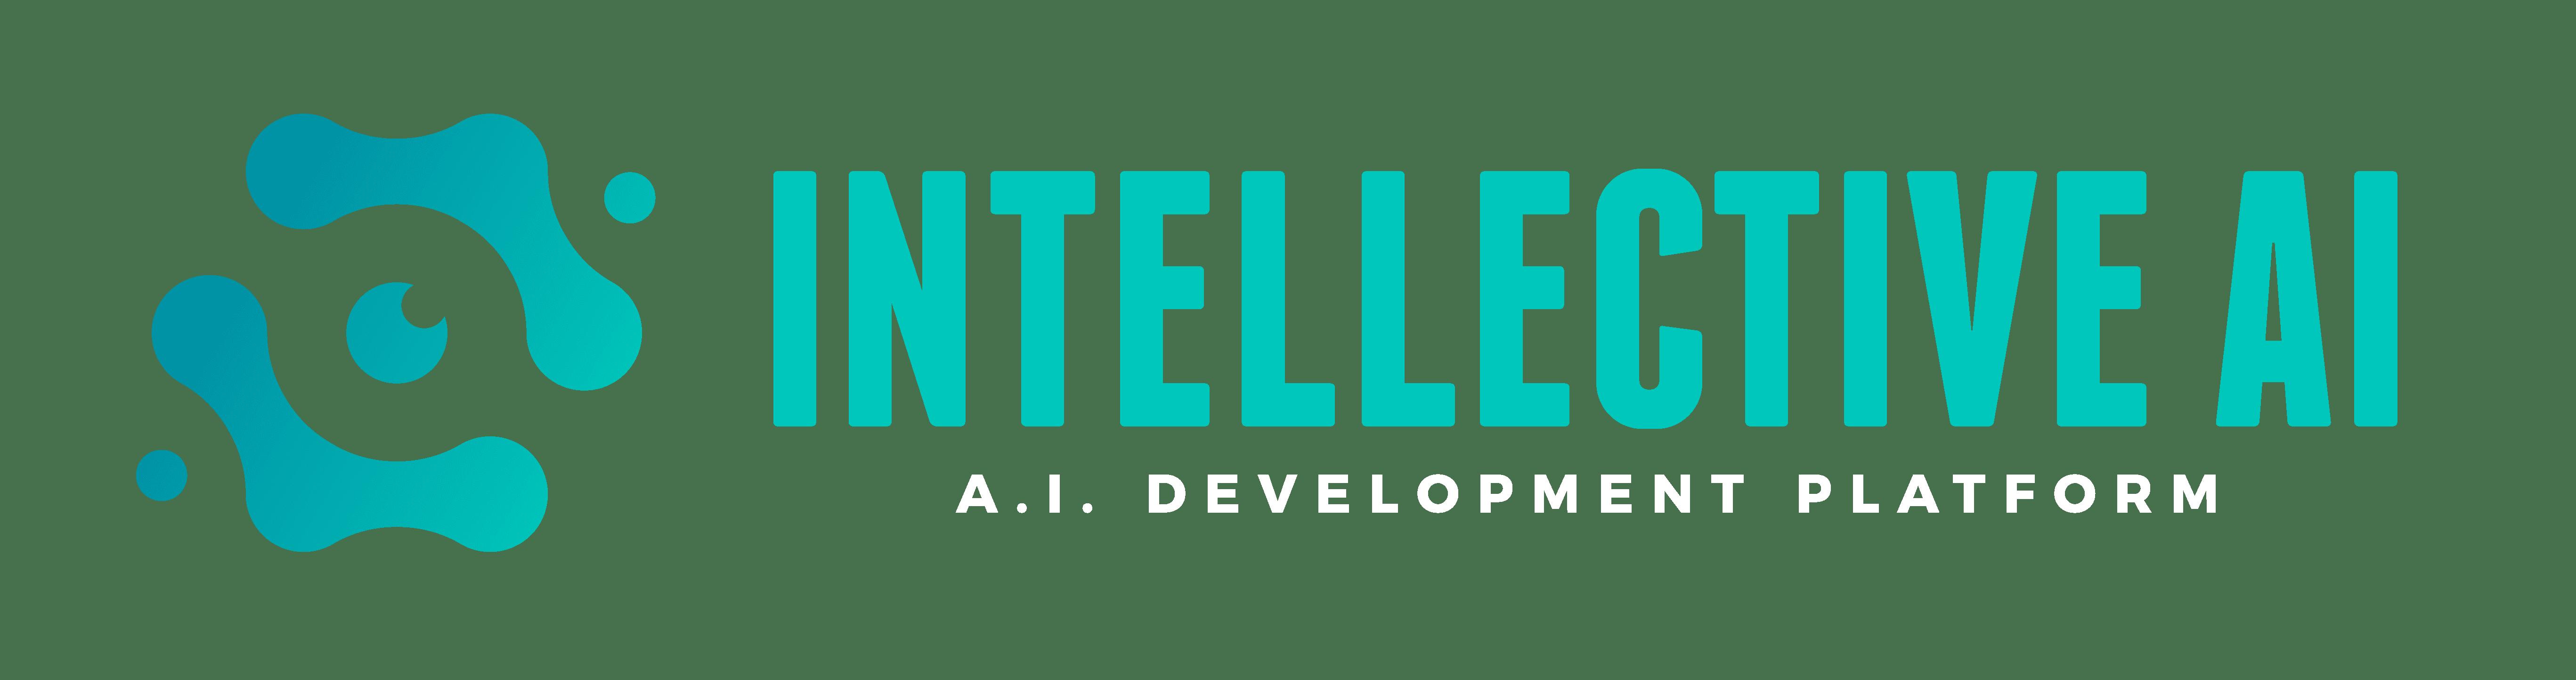 Intellective AI icon